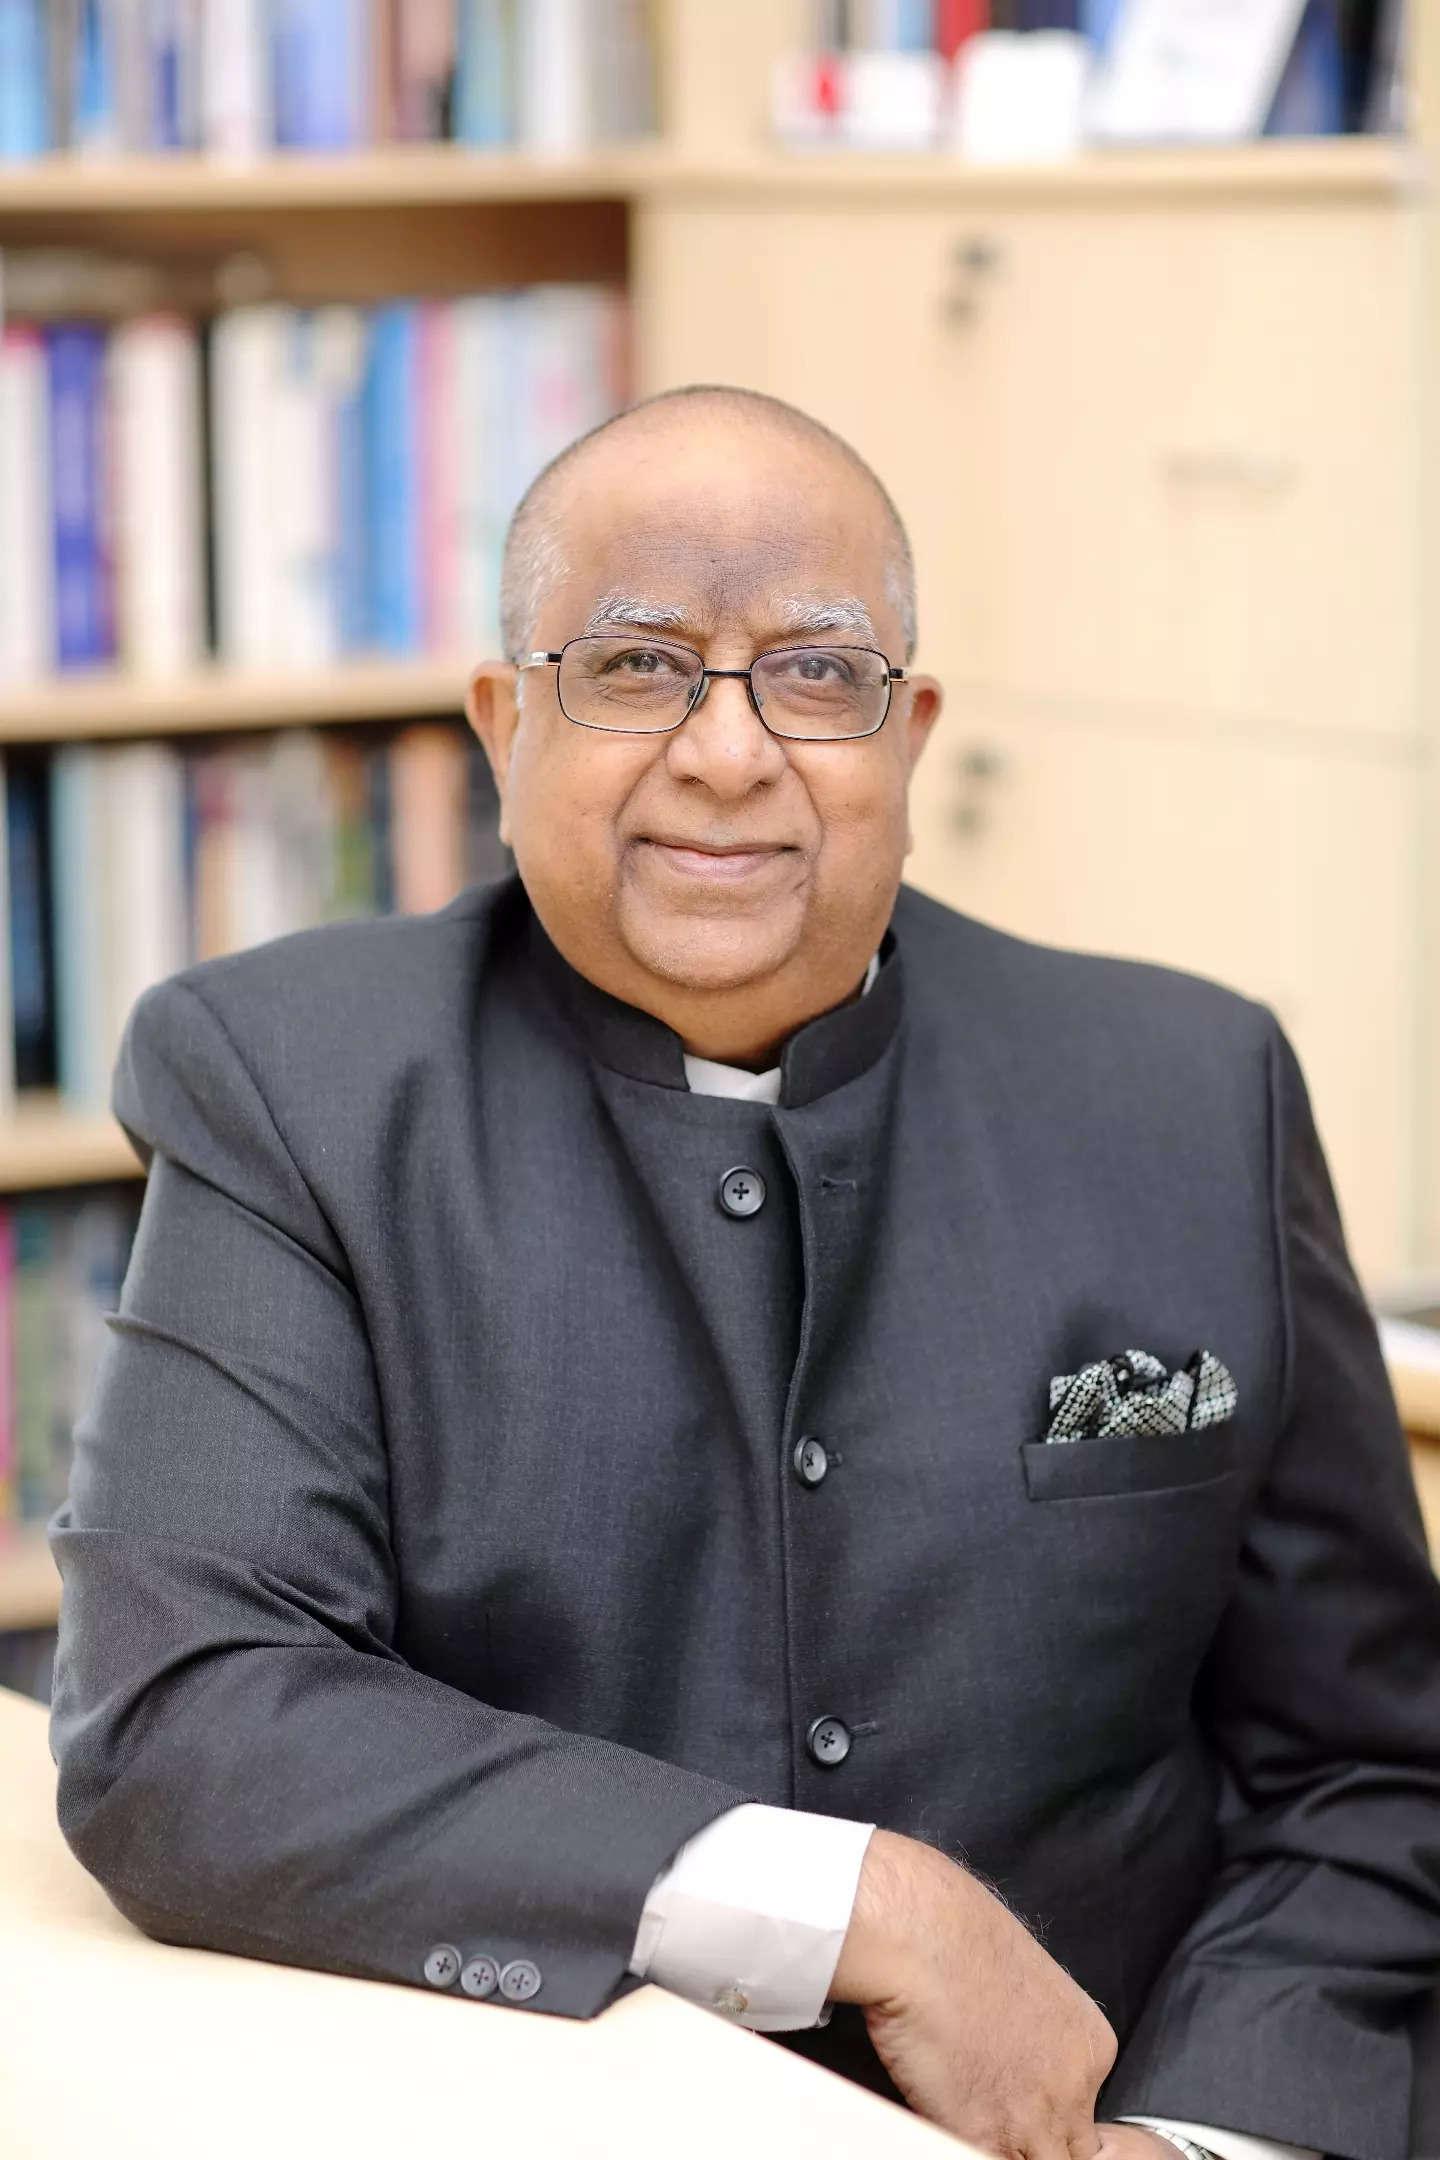 Professor Rajendra Srivastava conferred with the 2021 AIMA- Kewal Nohria Award